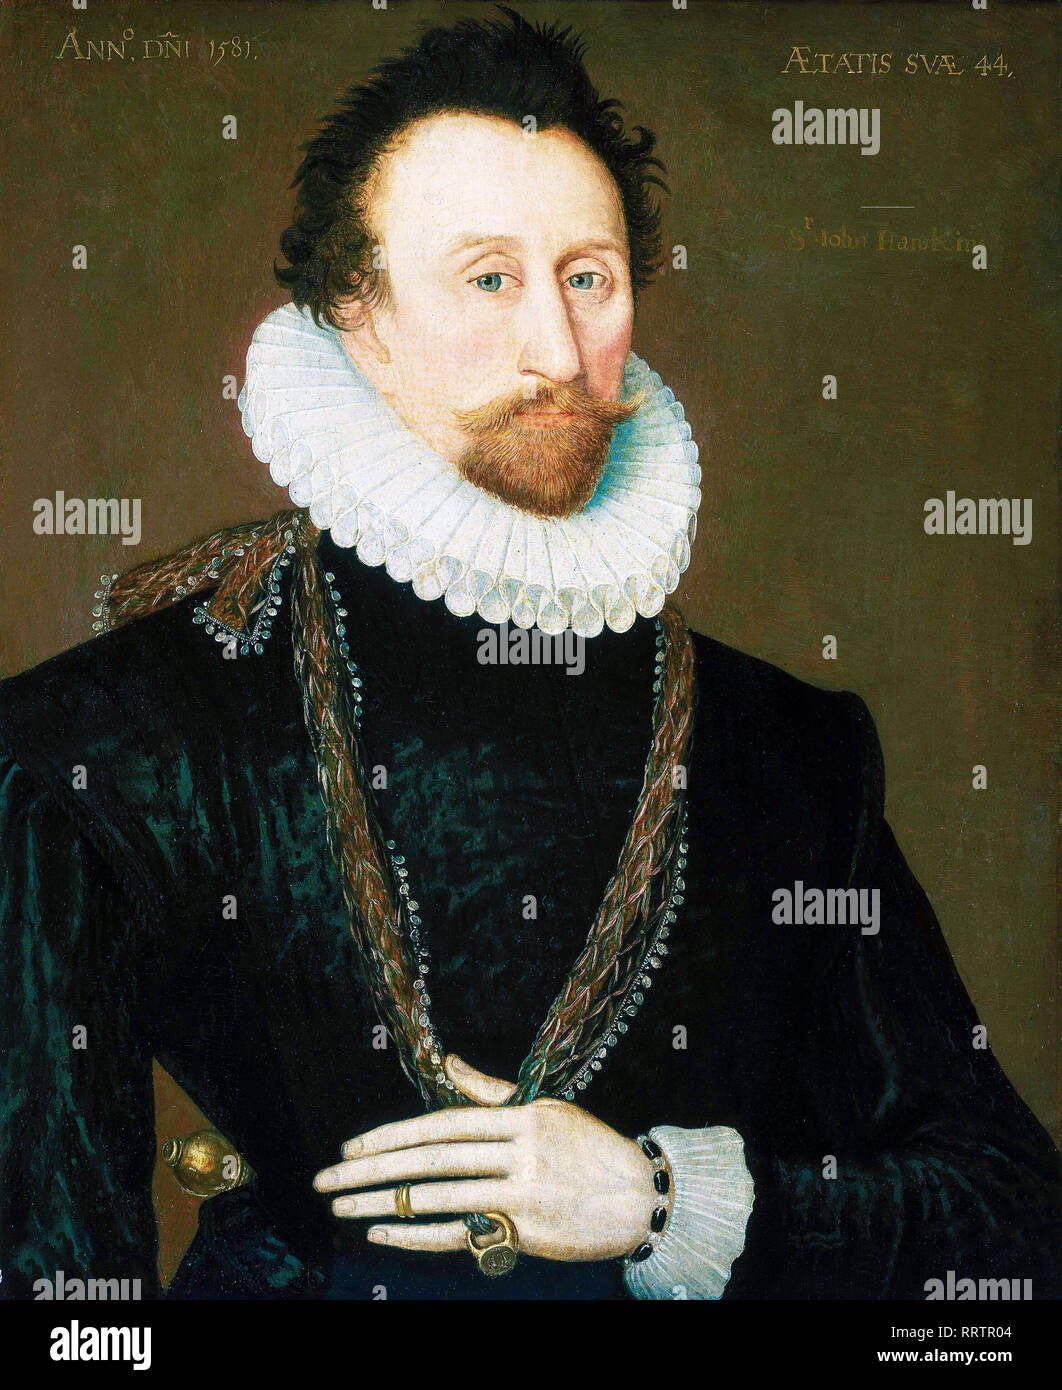 Sir John Hawkins (1532-95), portrait painting, 1581 - Stock Image